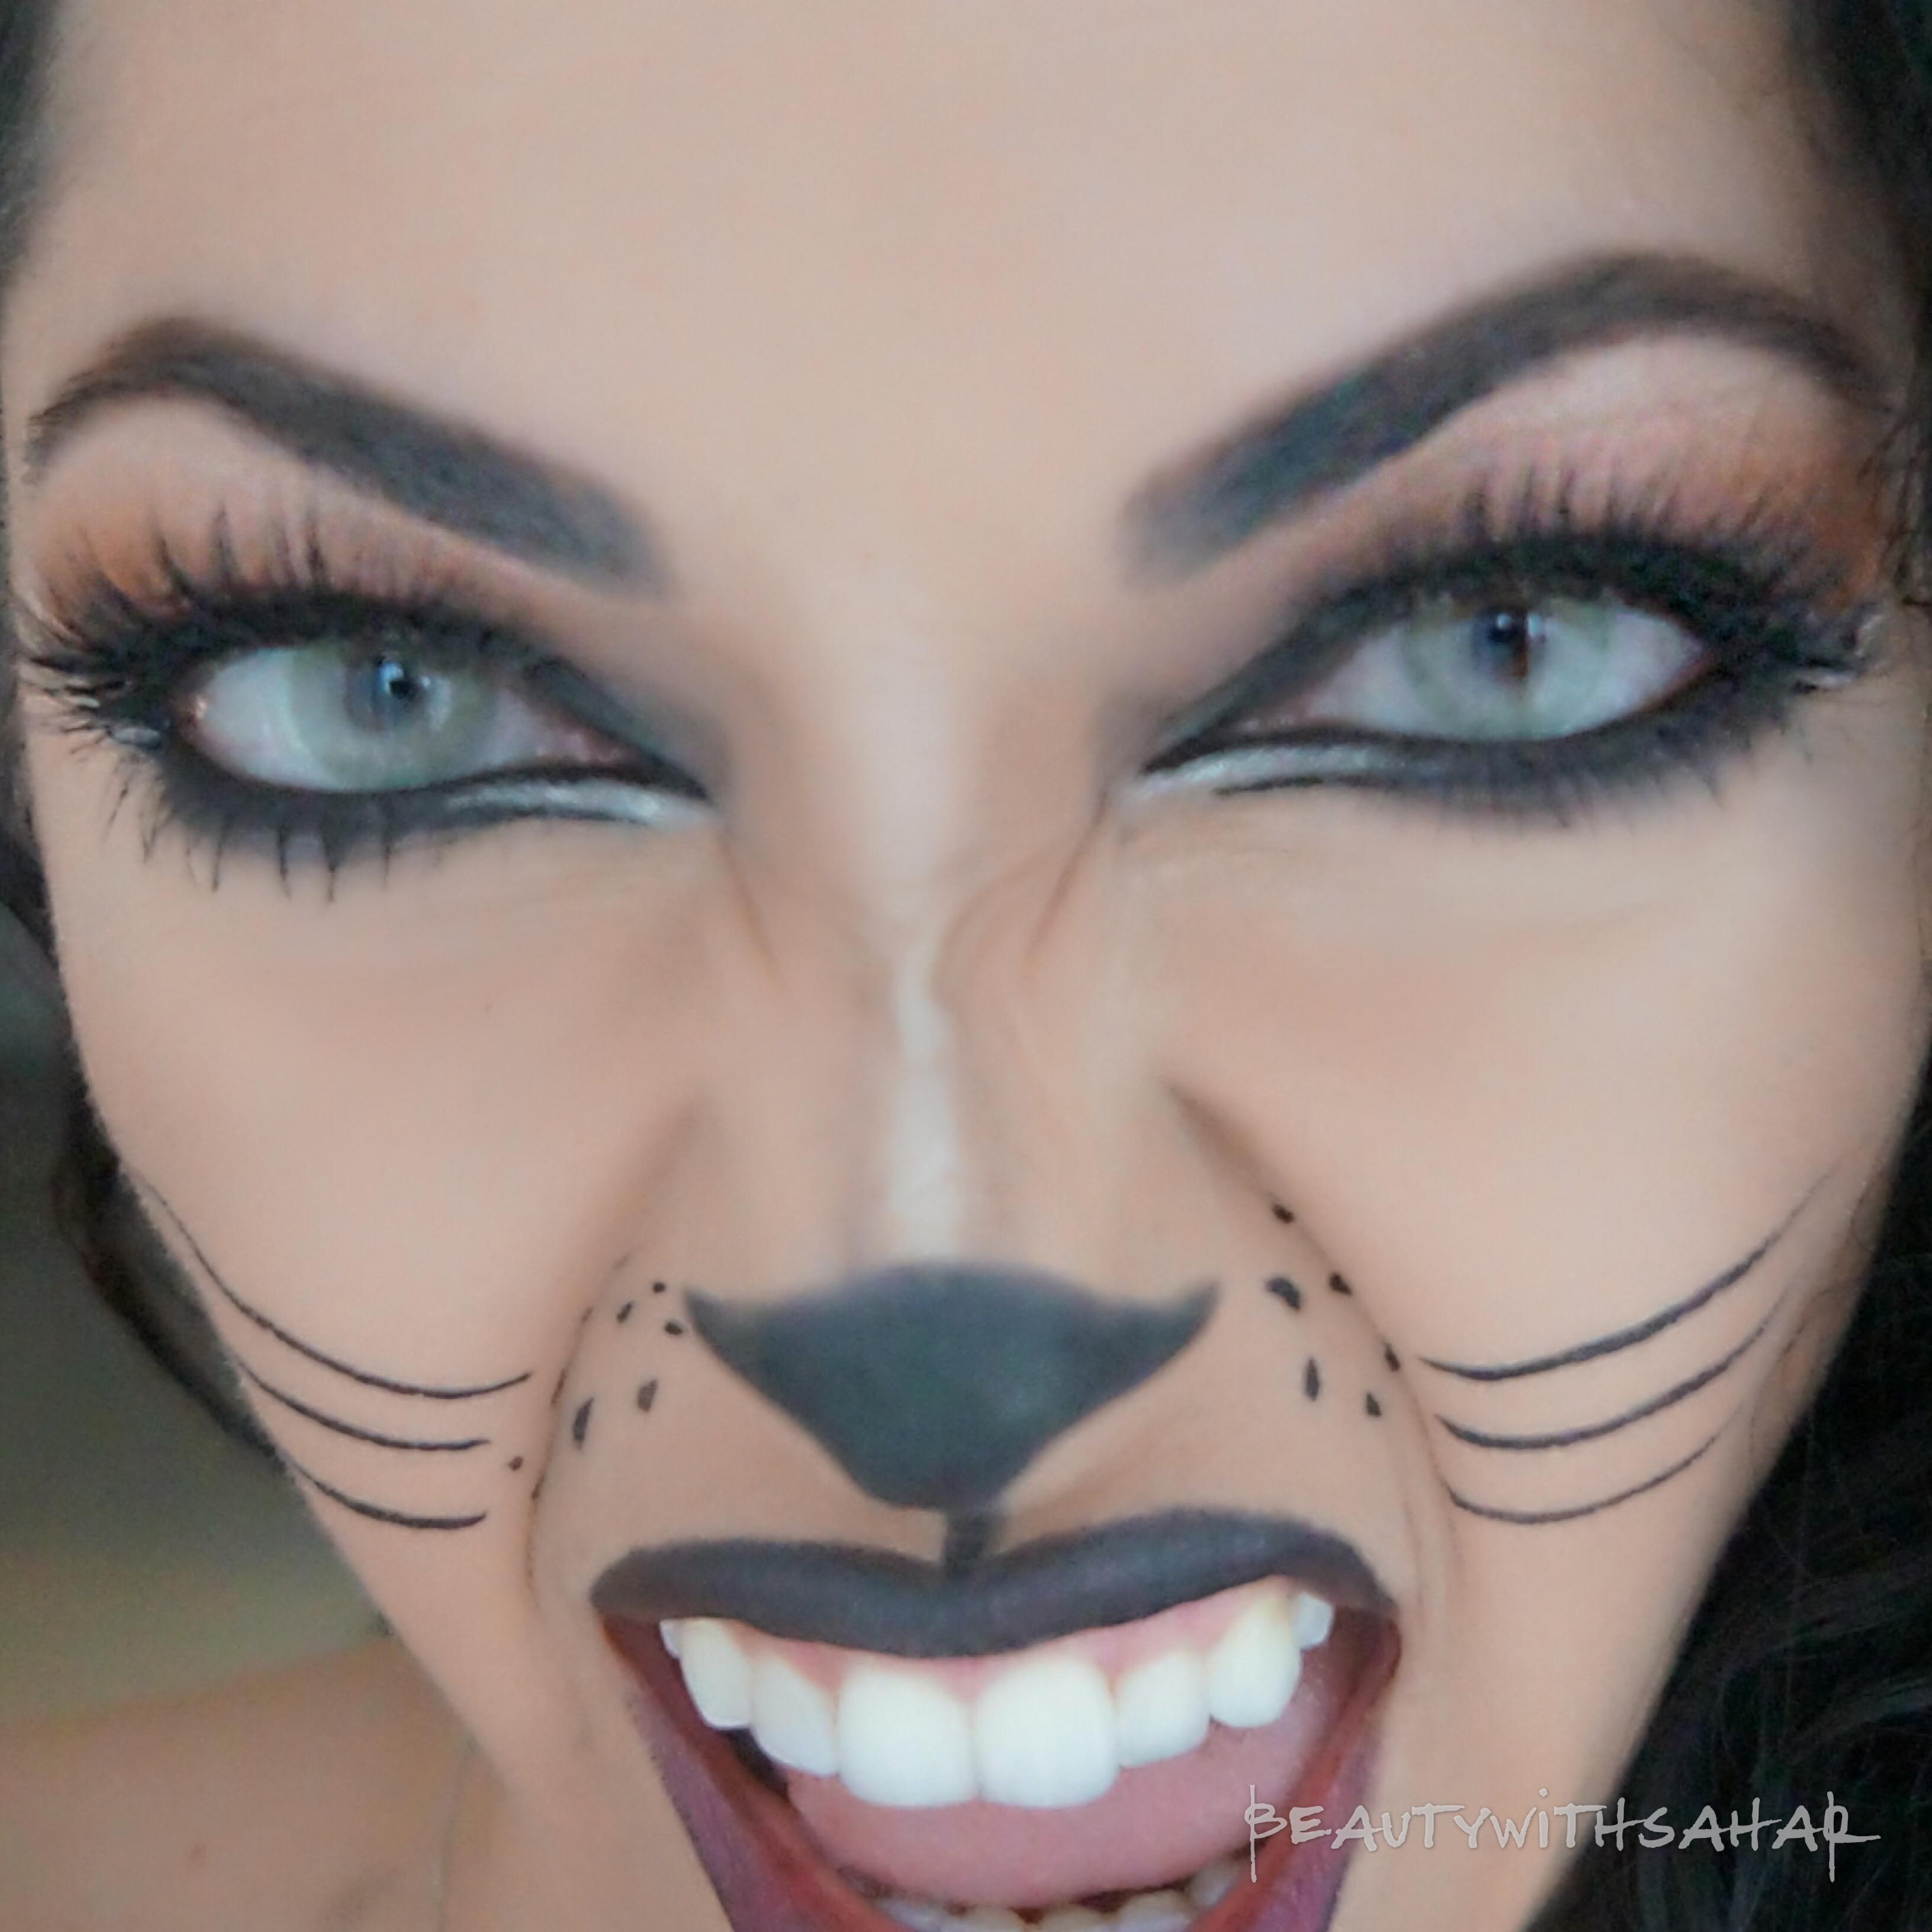 Kitty Cat Halloween Make-up! | beautywithsahar